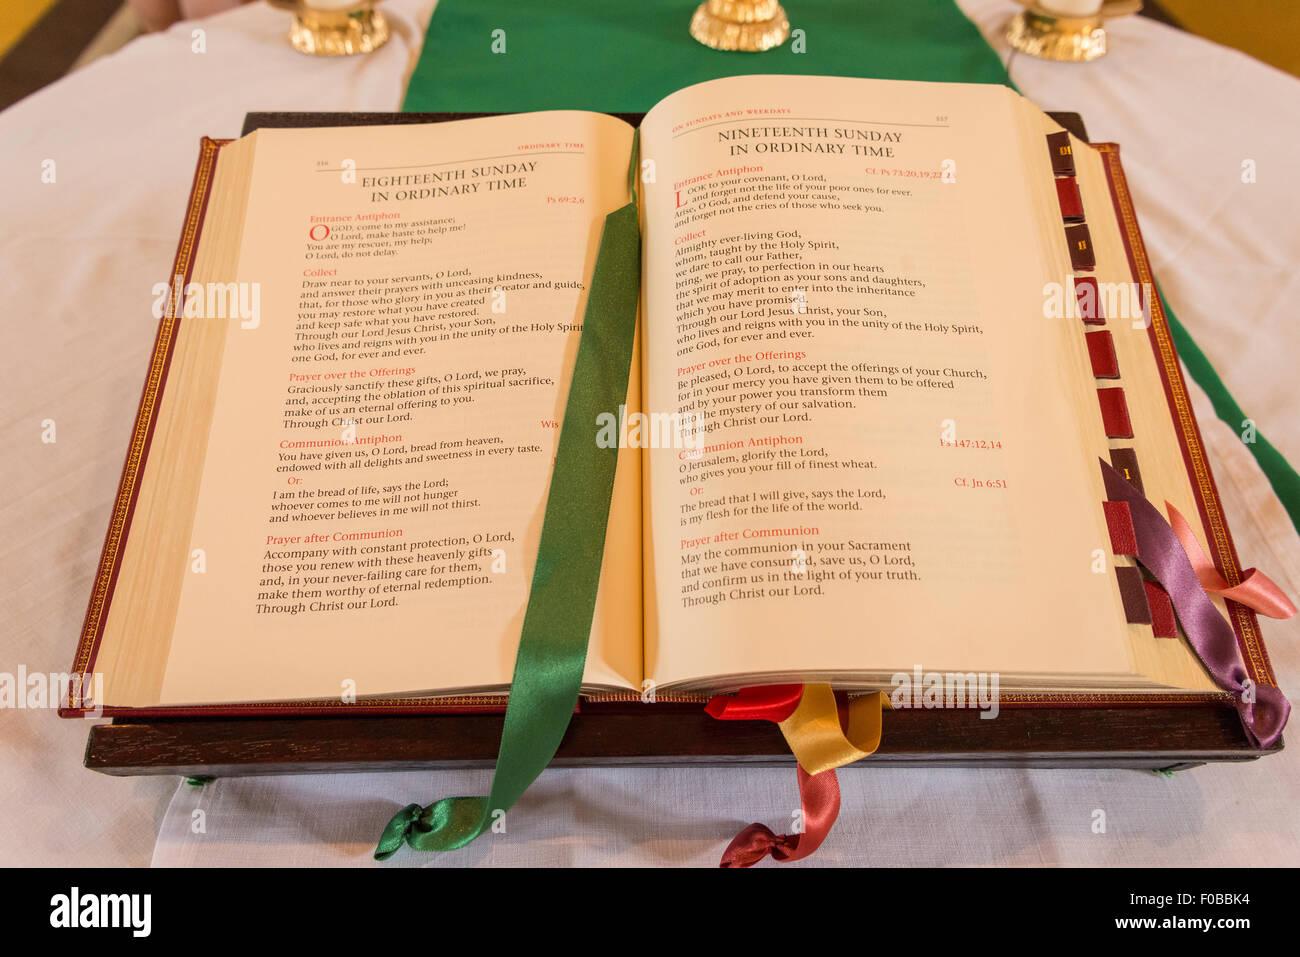 Prayer Book on altar, St Augustines Roman Catholic Church, Daventry, Northamptonshire, England, United Kingdom - Stock Image